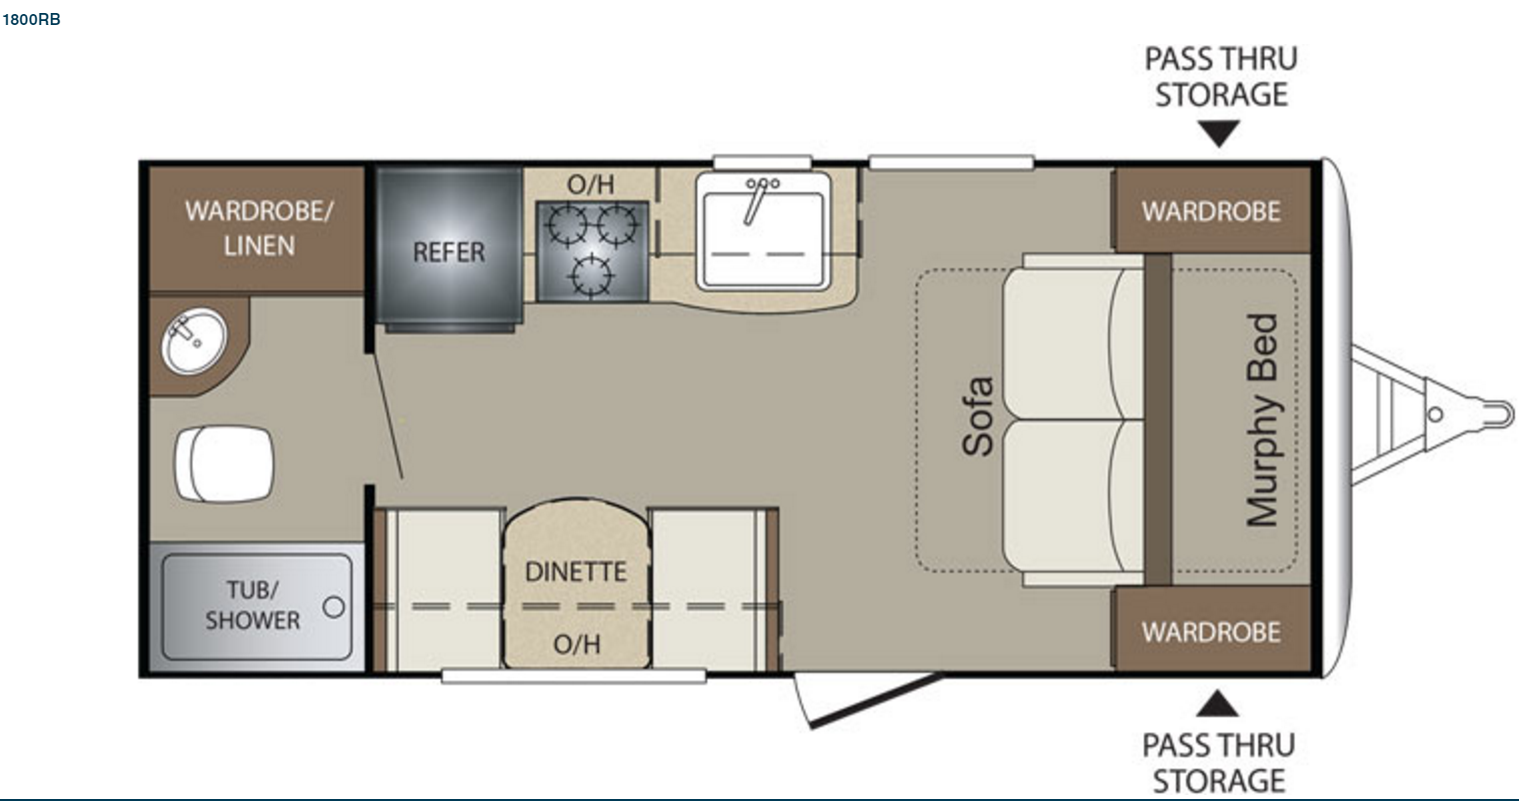 2017 Keystone Bullet Crossfire 1800RB- Floor Plan